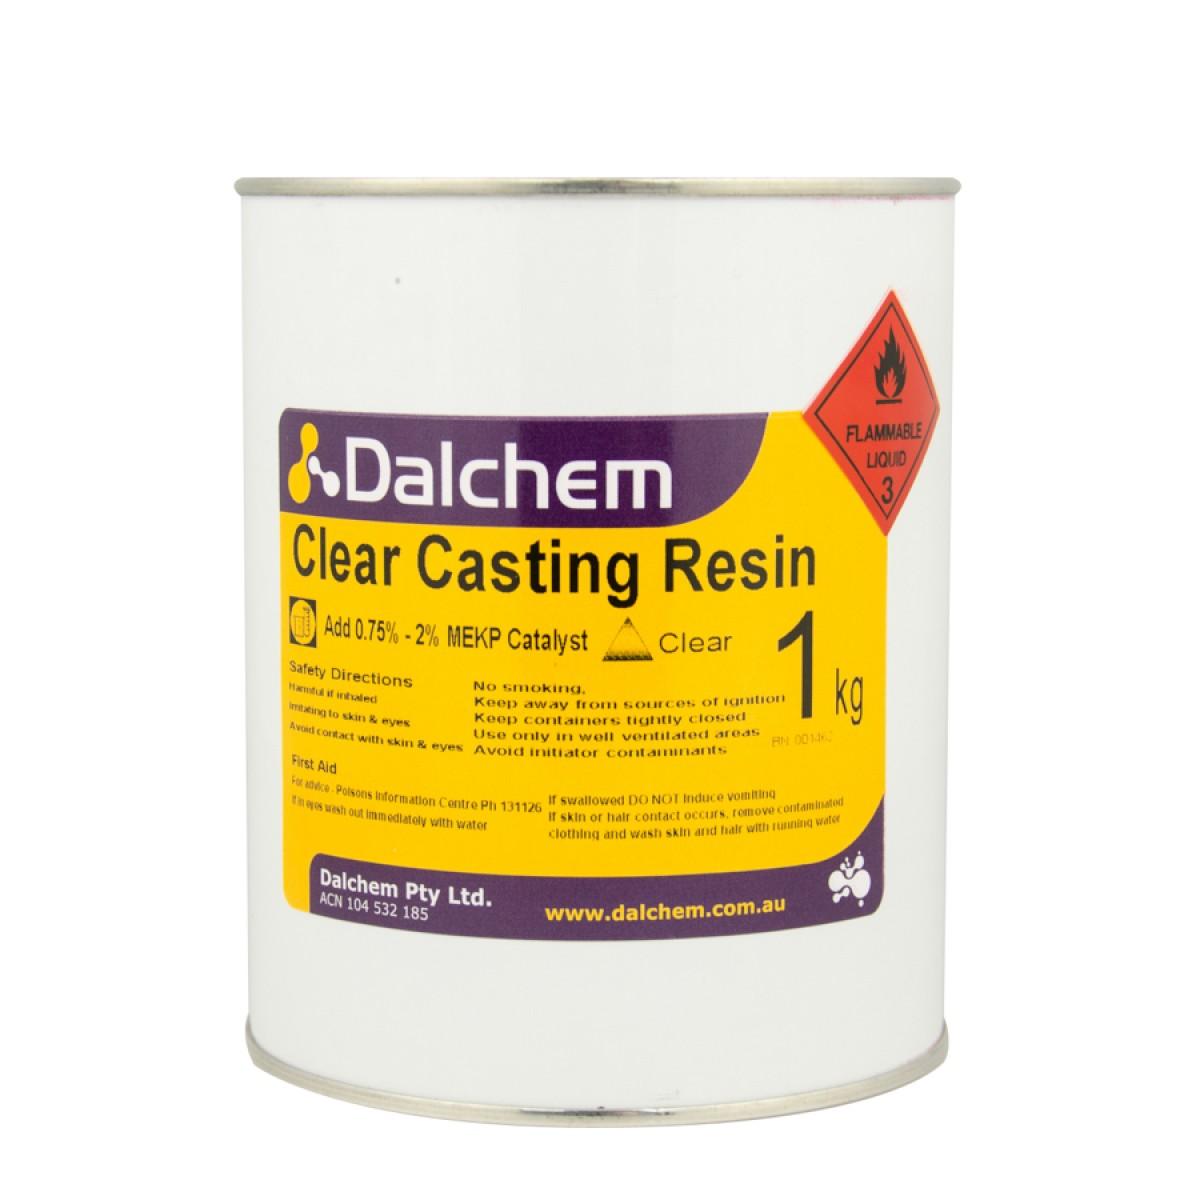 Polyester Resin | Polyester Casting Resin Supplies Australia